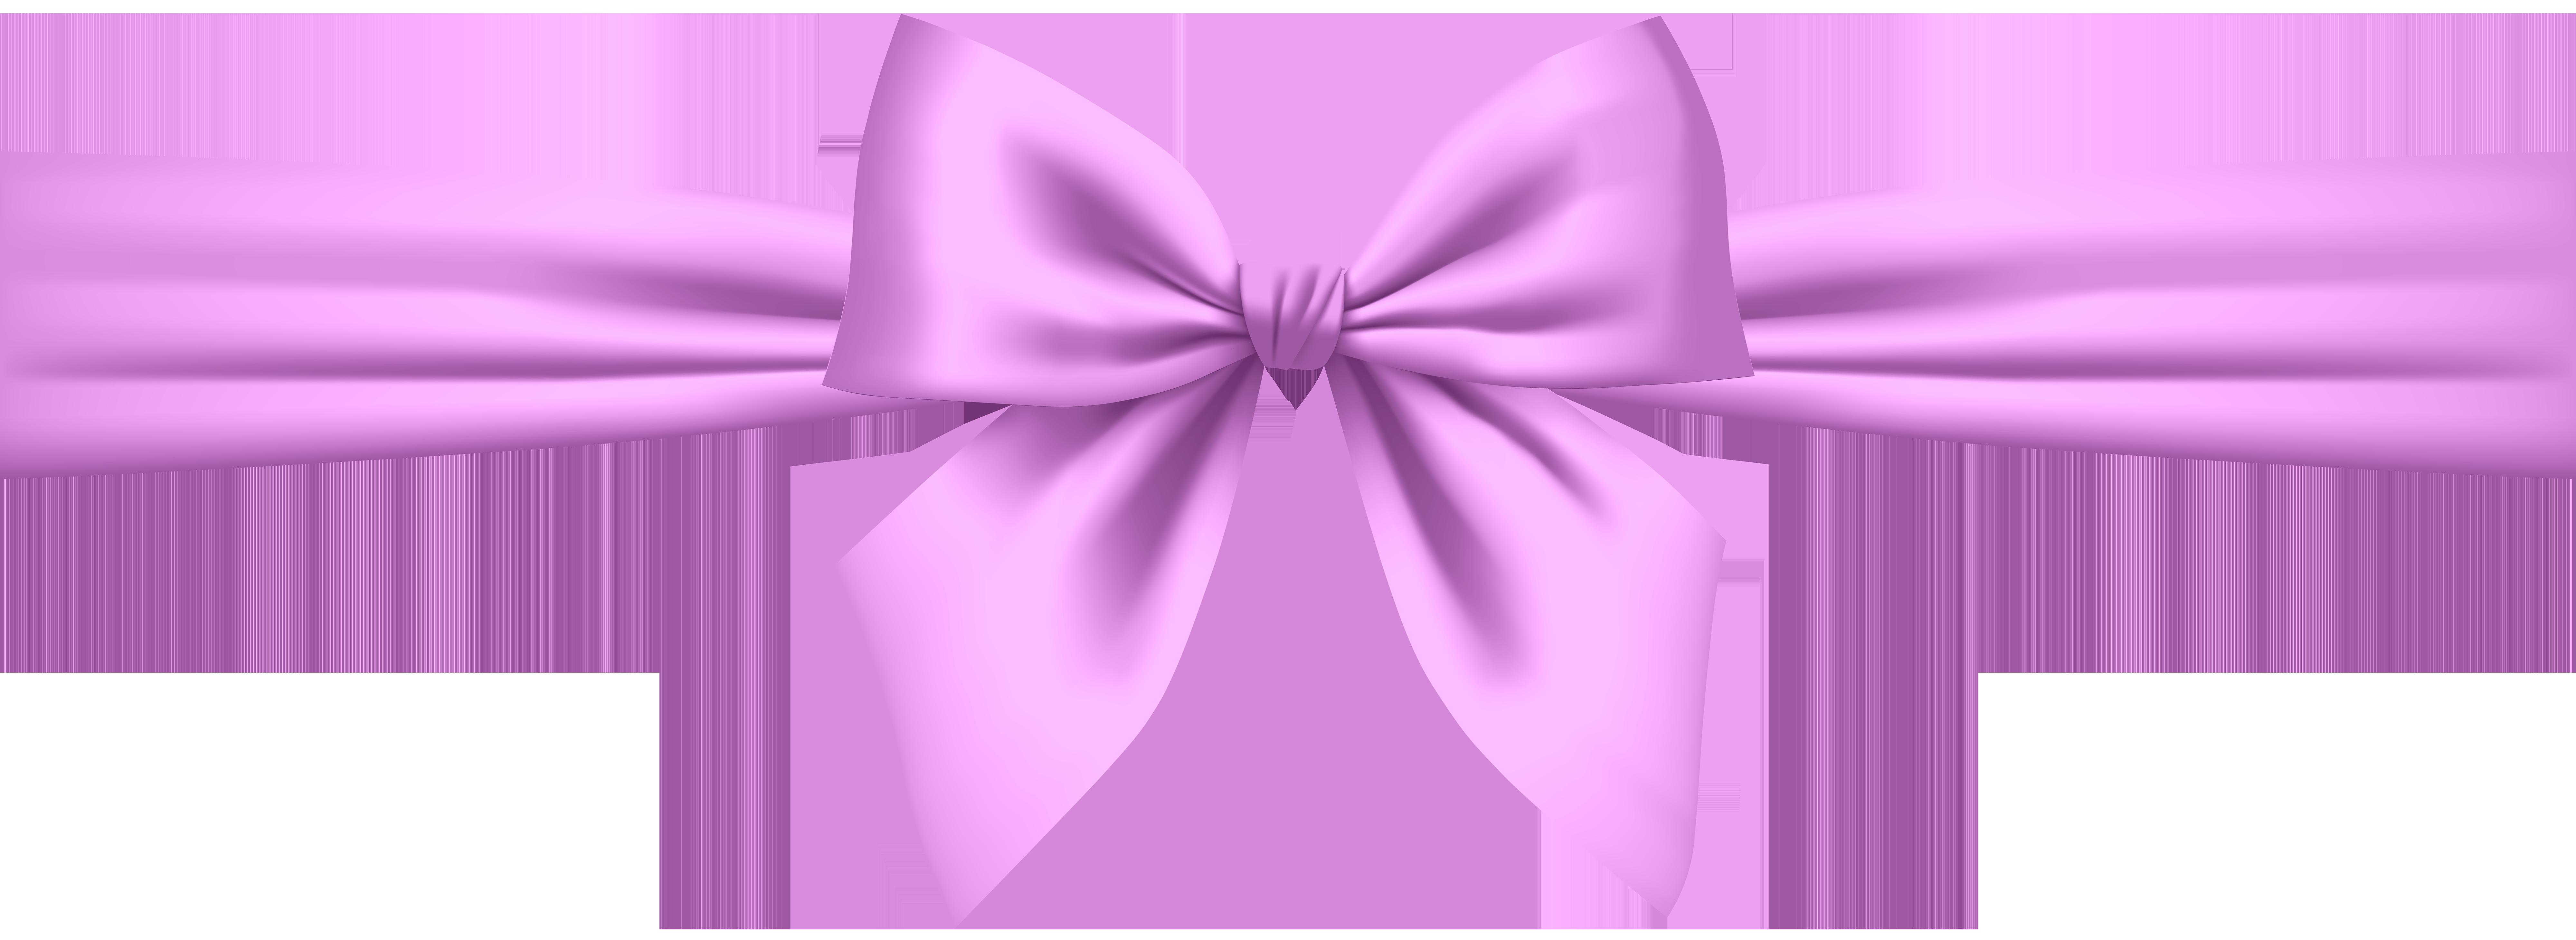 Pink bow png clip. Lavender clipart transparent background